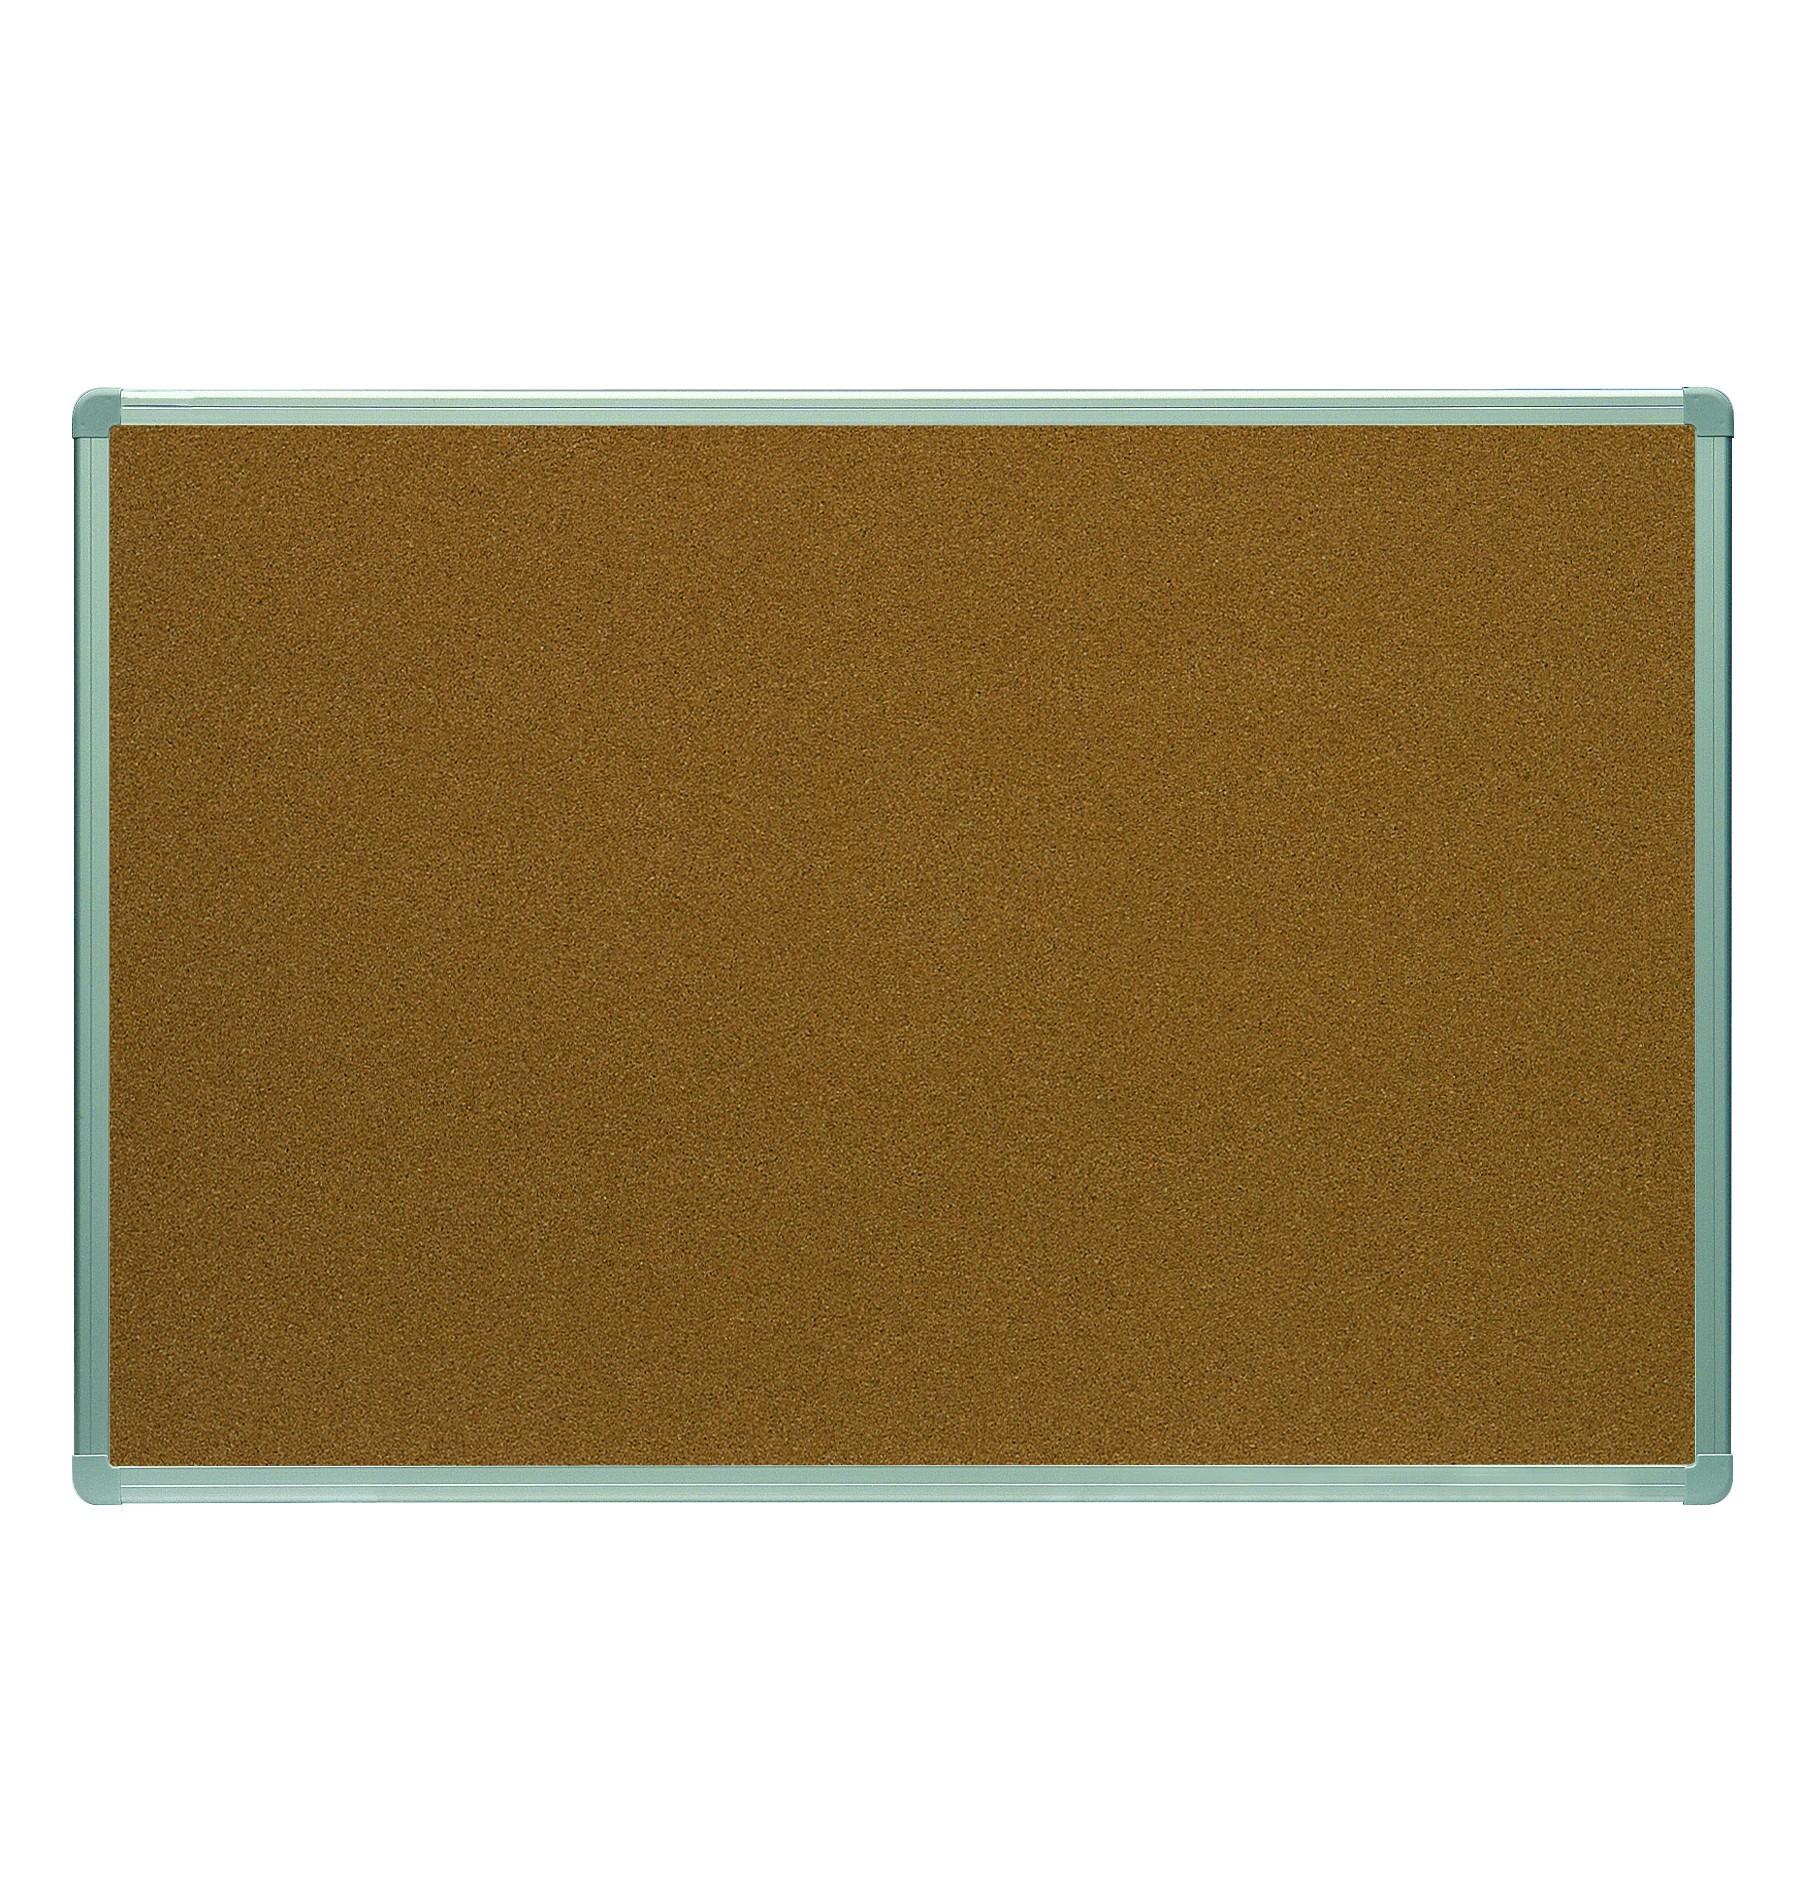 CORK BOARD 120x180cm PROFILE ALUMINUM